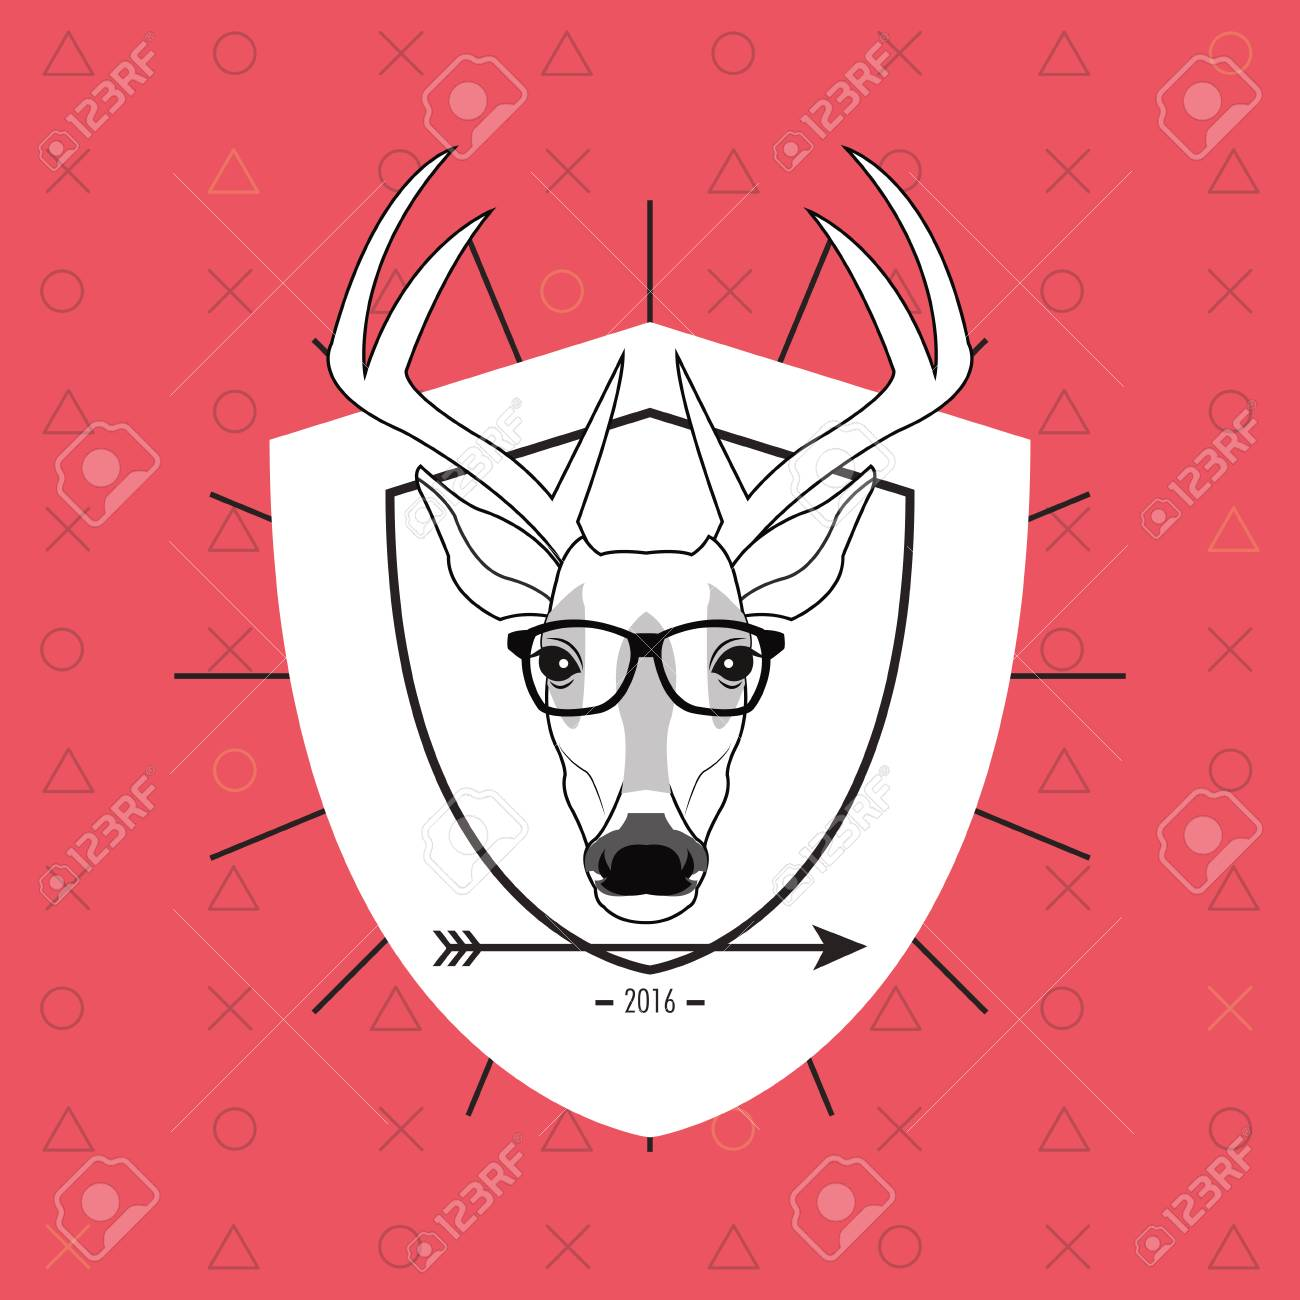 Attraktiv Flat Design Hipster Style Deer Image Vector Illustration Stock Vector    62555676